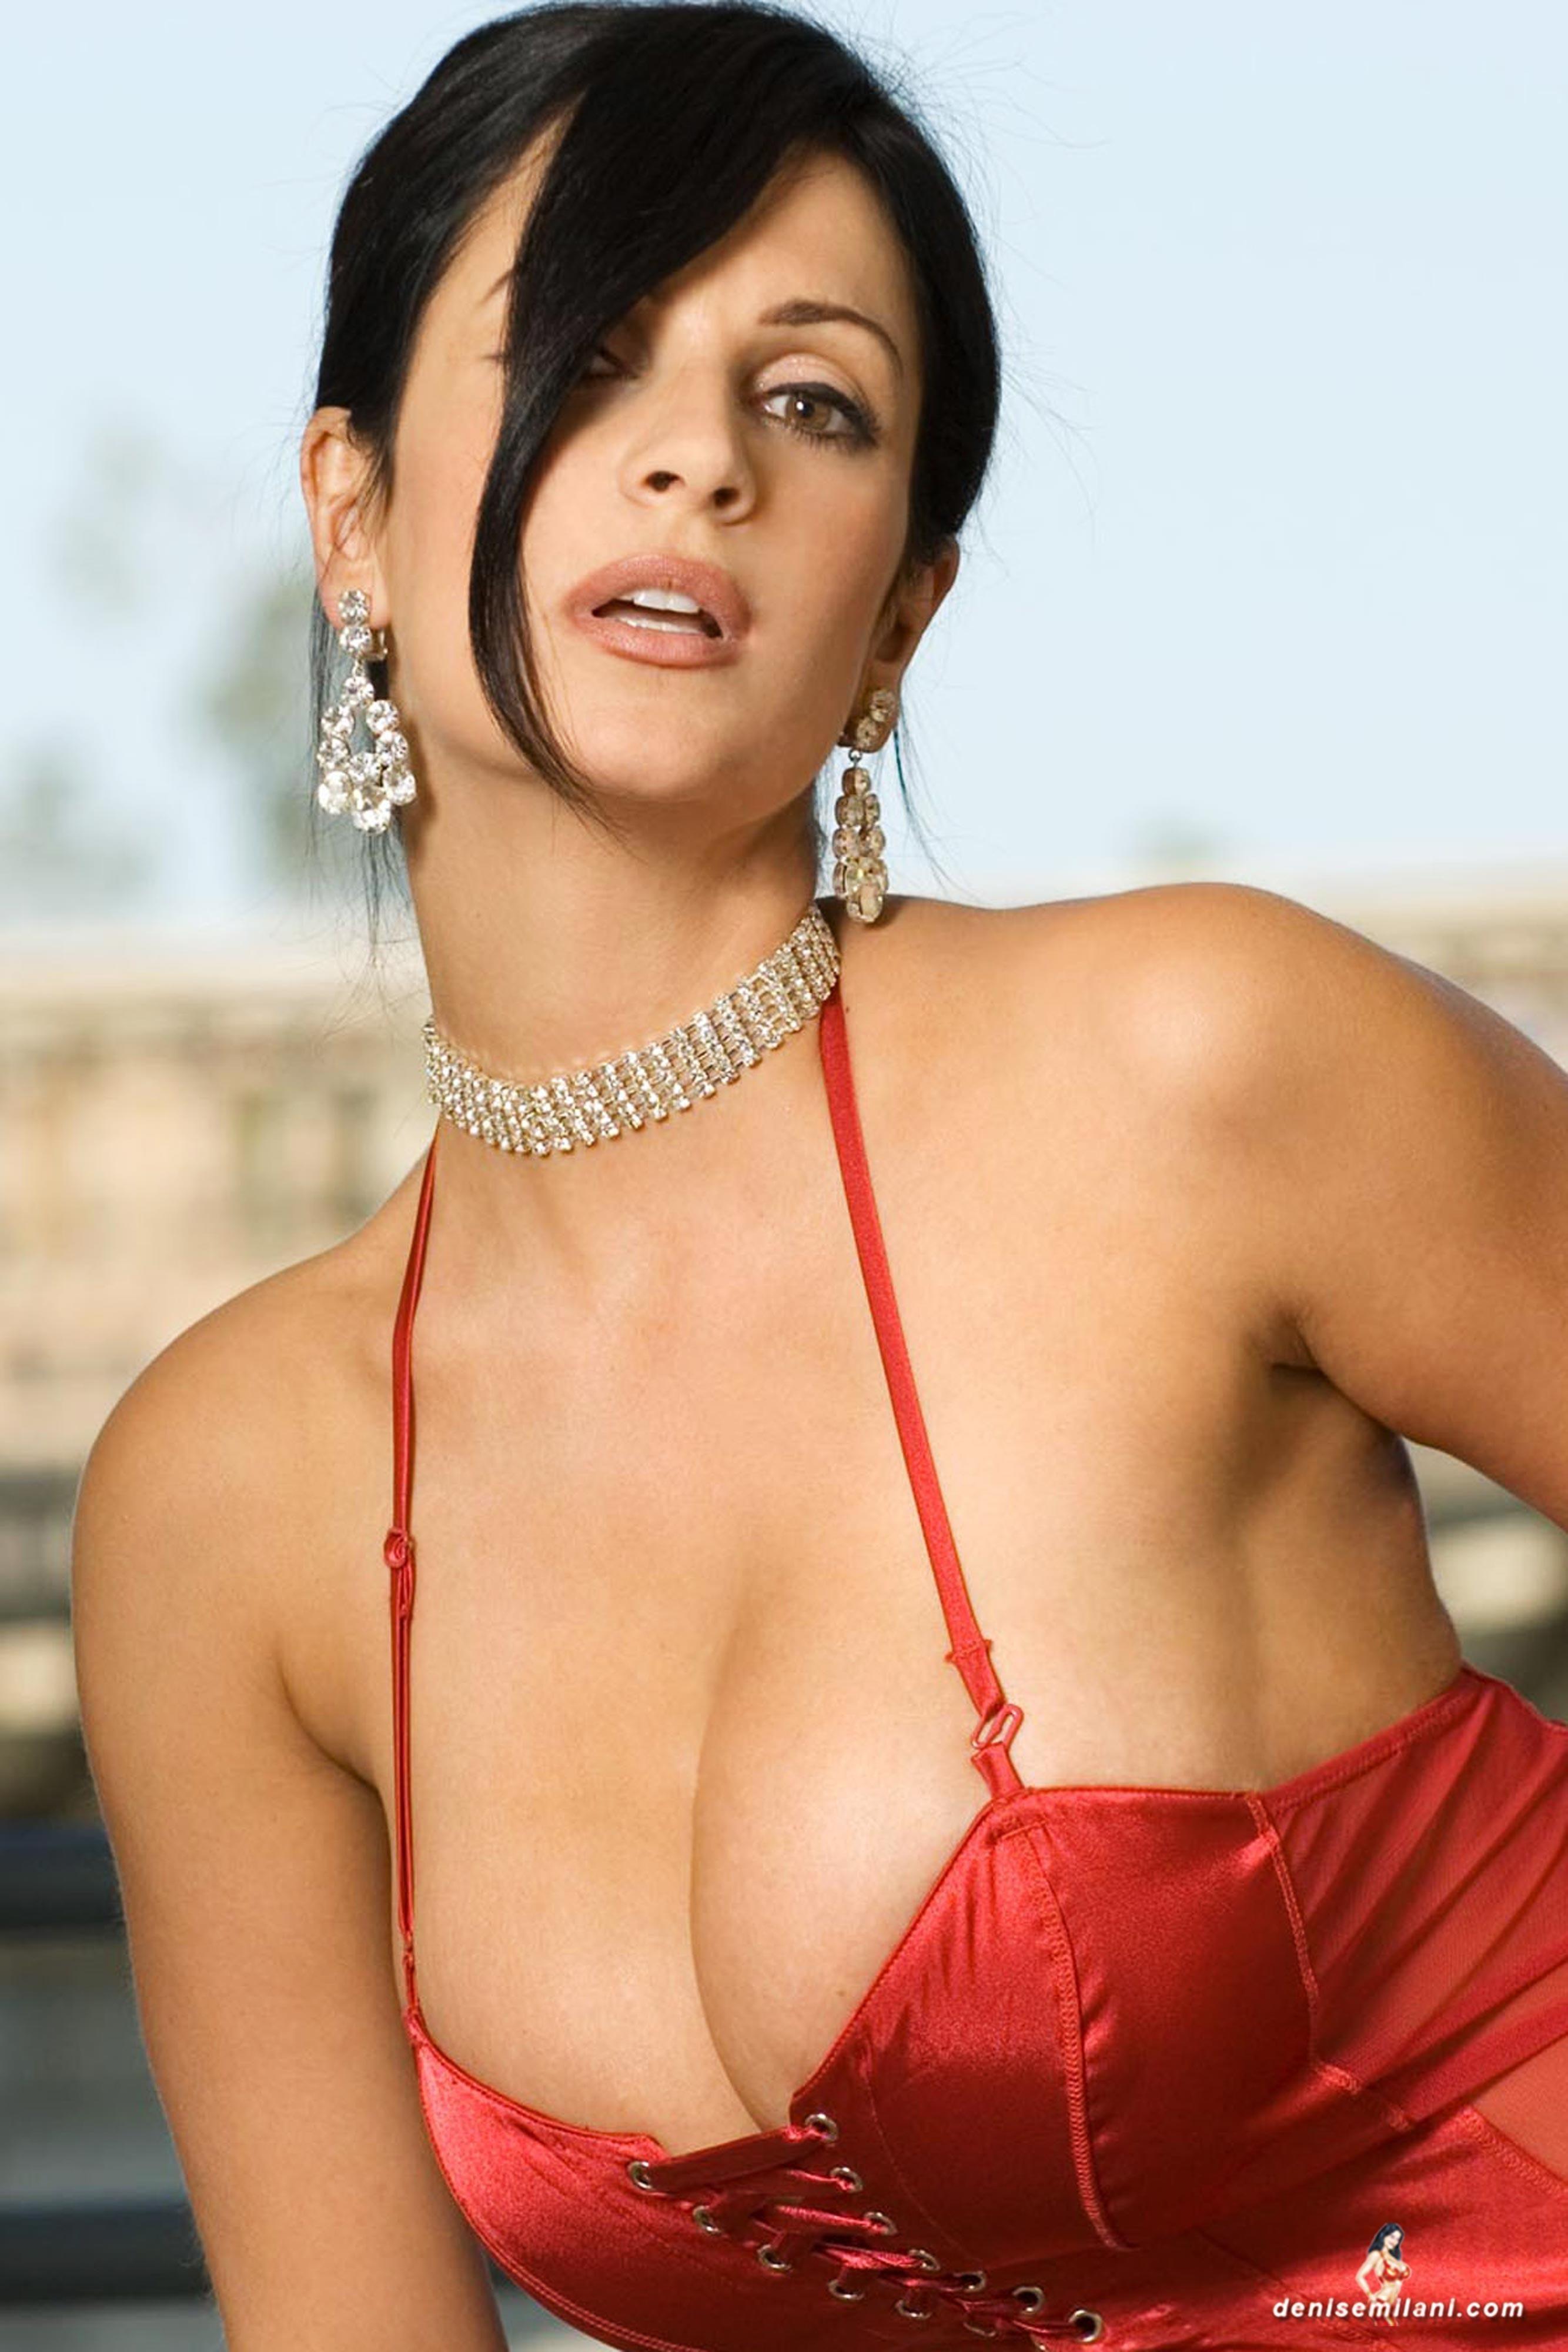 Hot Melody Milani nudes (75 photo), Sexy, Hot, Feet, butt 2020